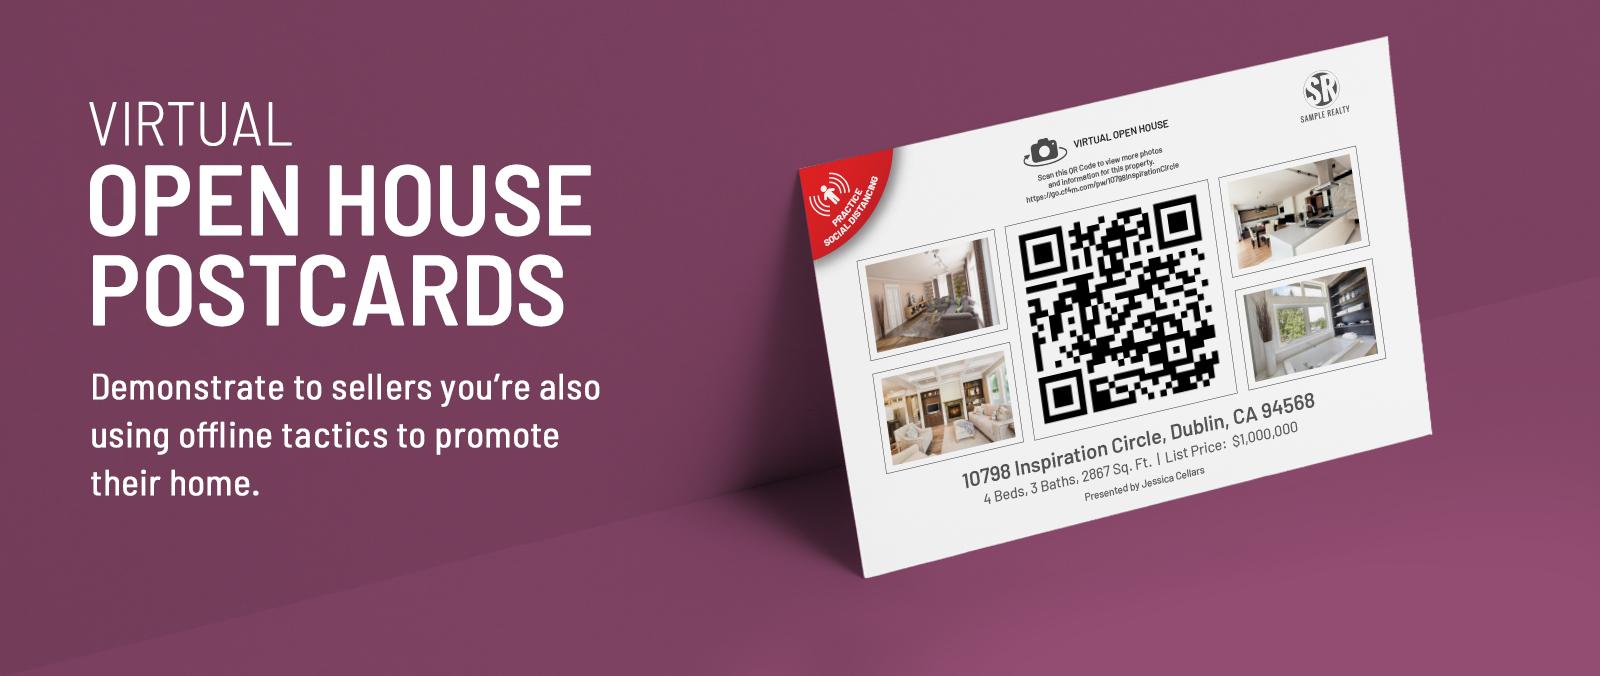 Virtual Open House Postcards